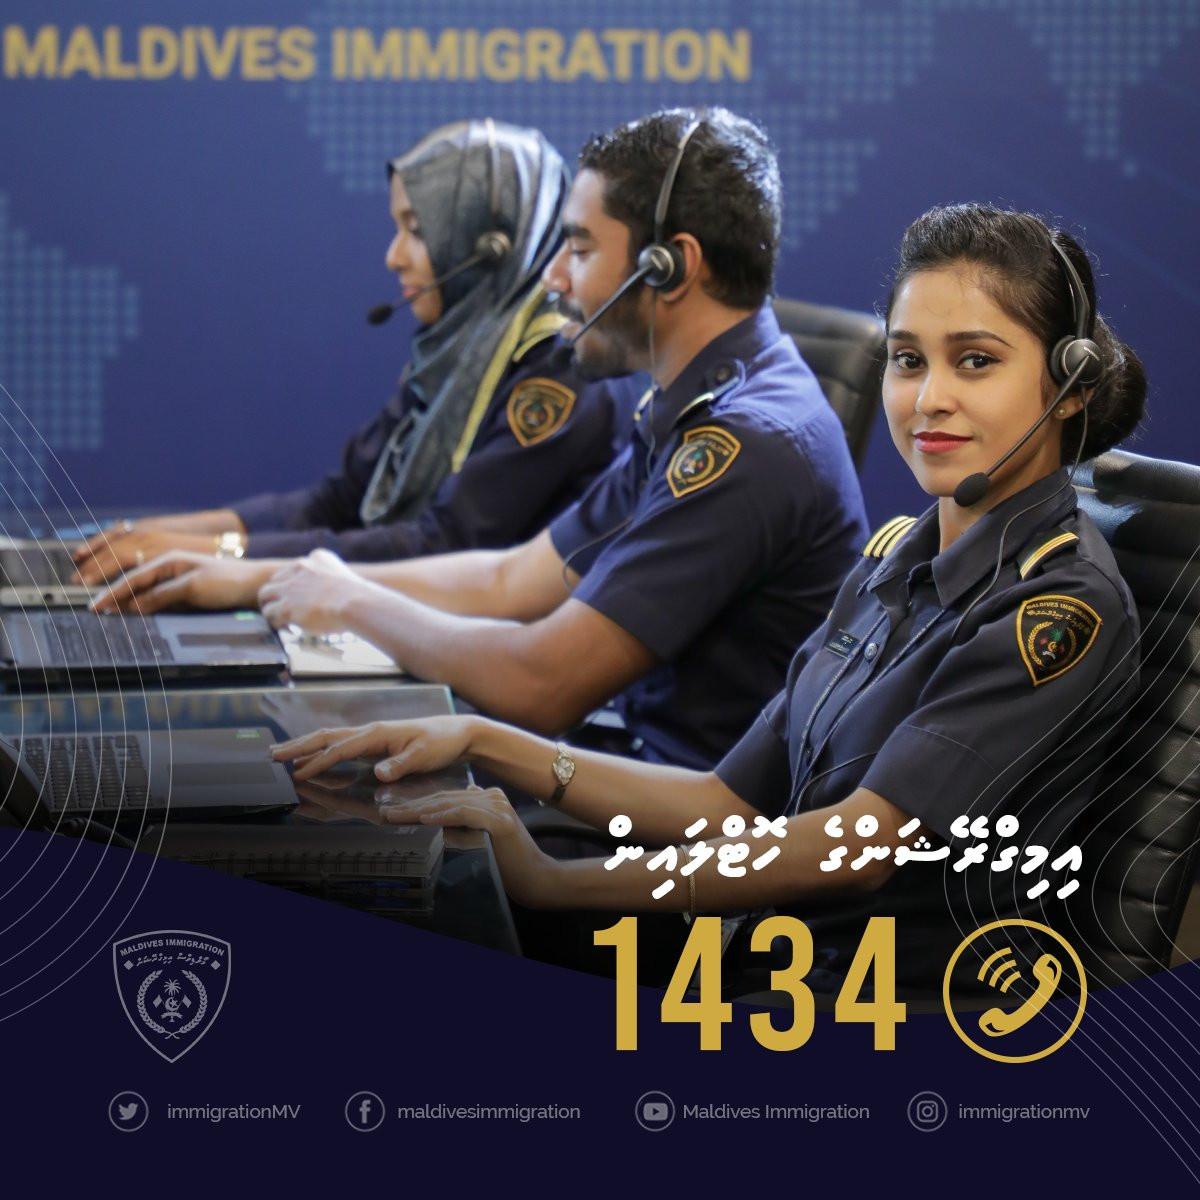 Maldives Immigration Launches Call Centre